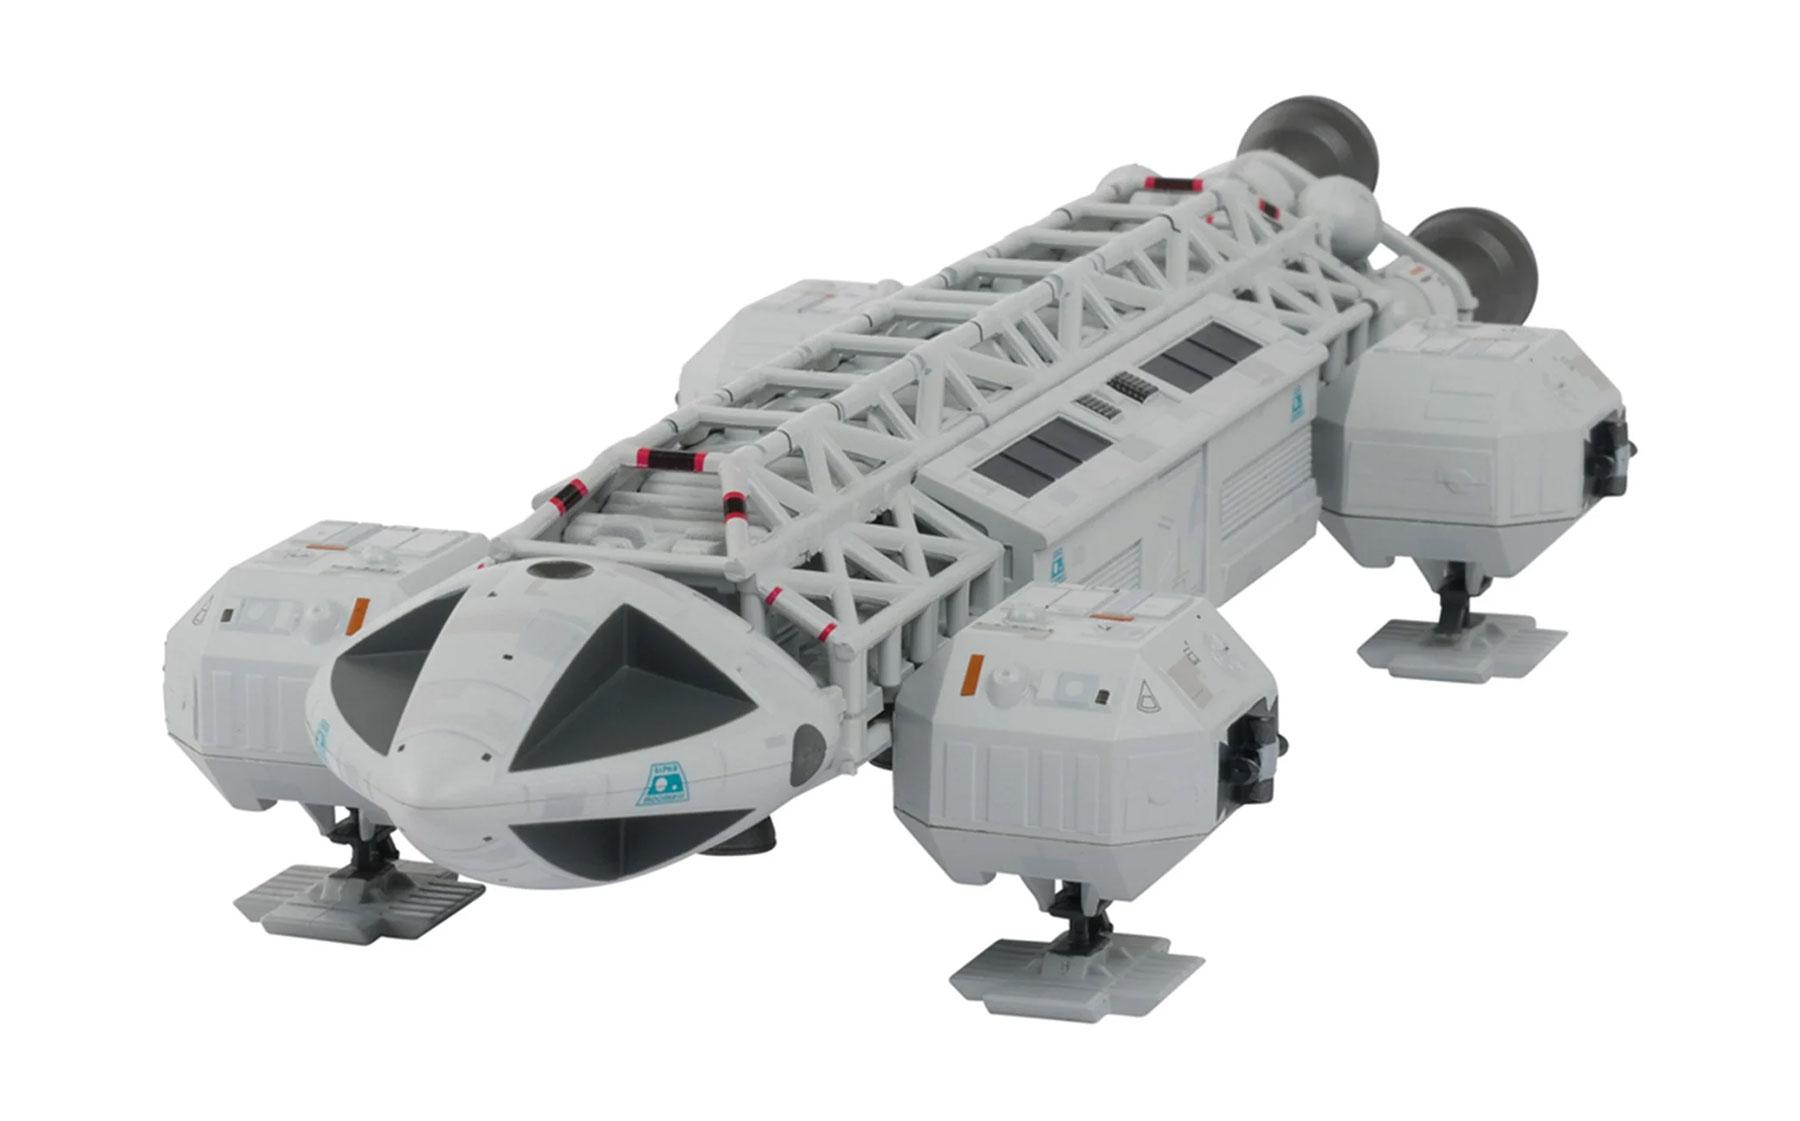 Eagle One Transporter Ship from Eaglemoss